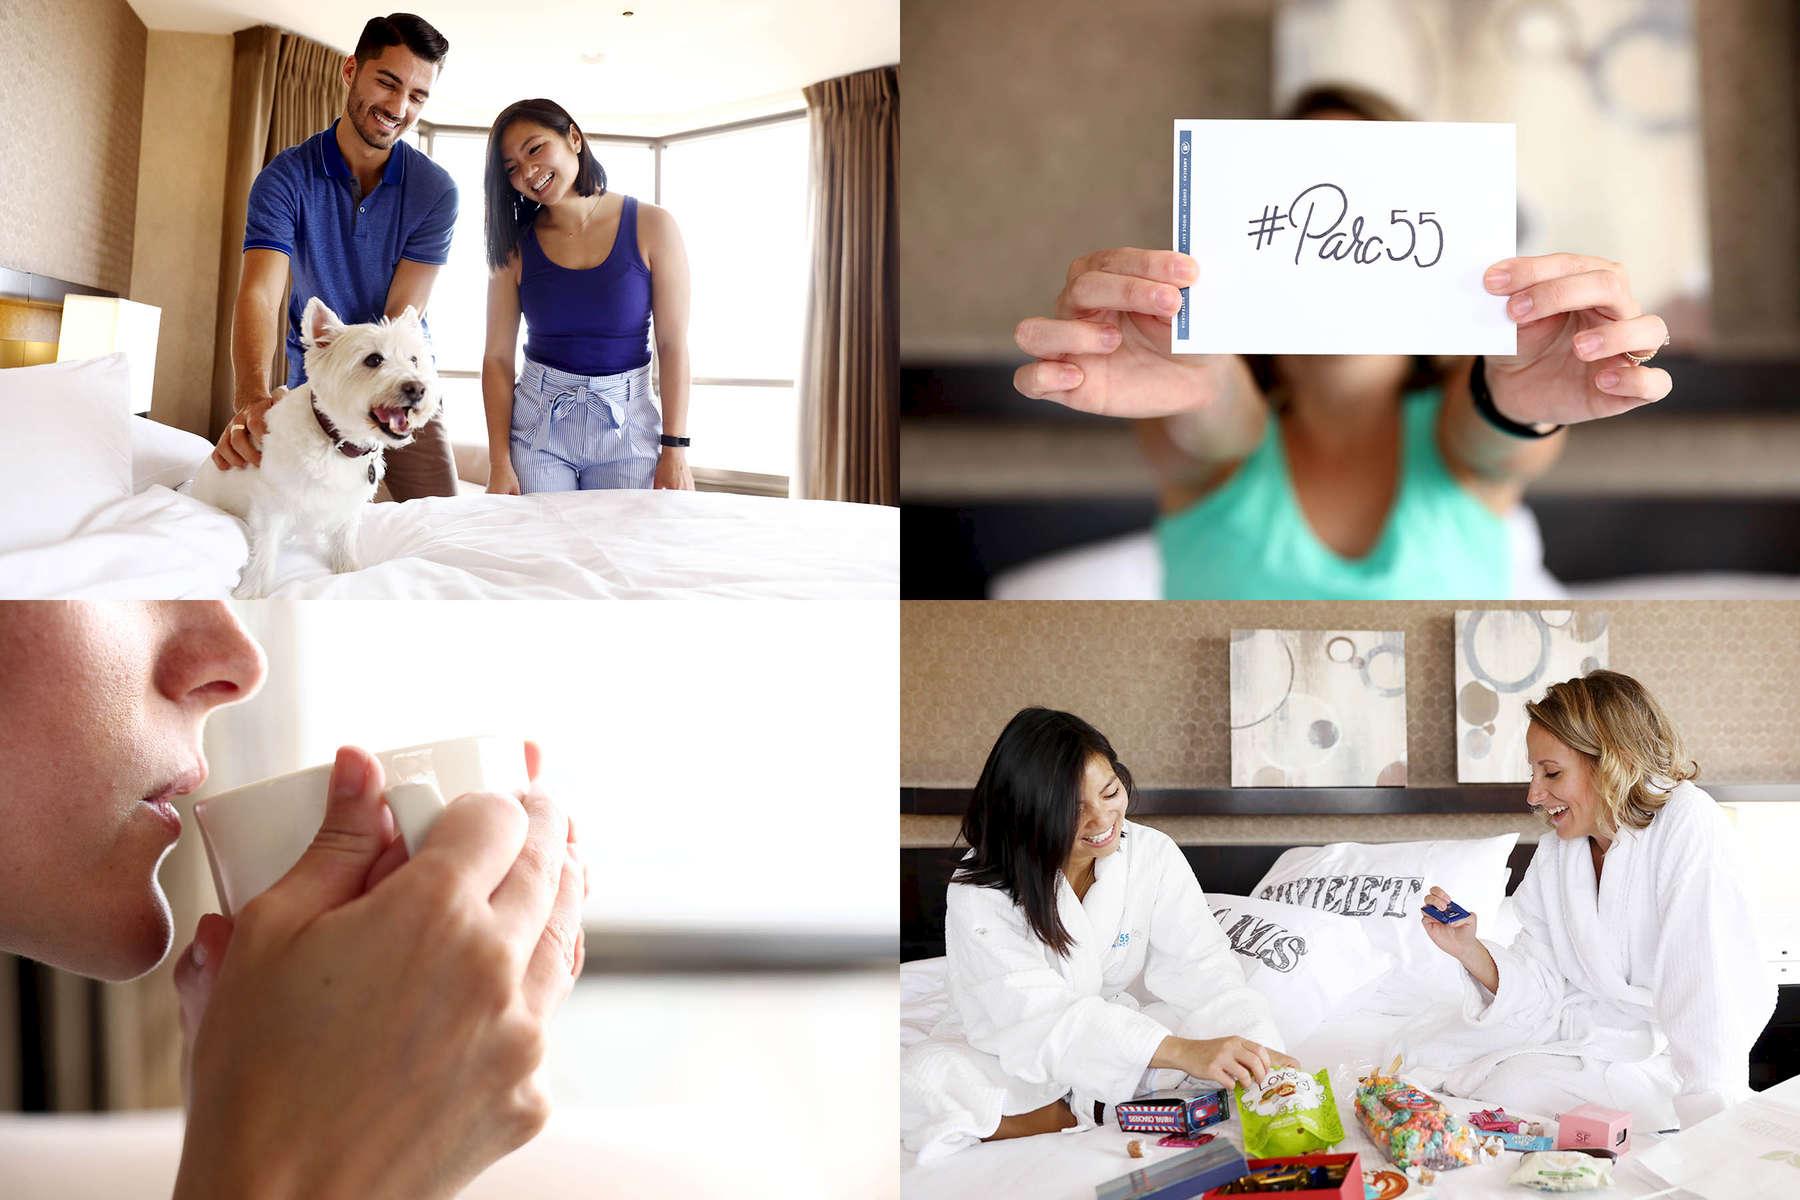 Hilton Parc 55 Social Campaign | Agency - Under the Influencers